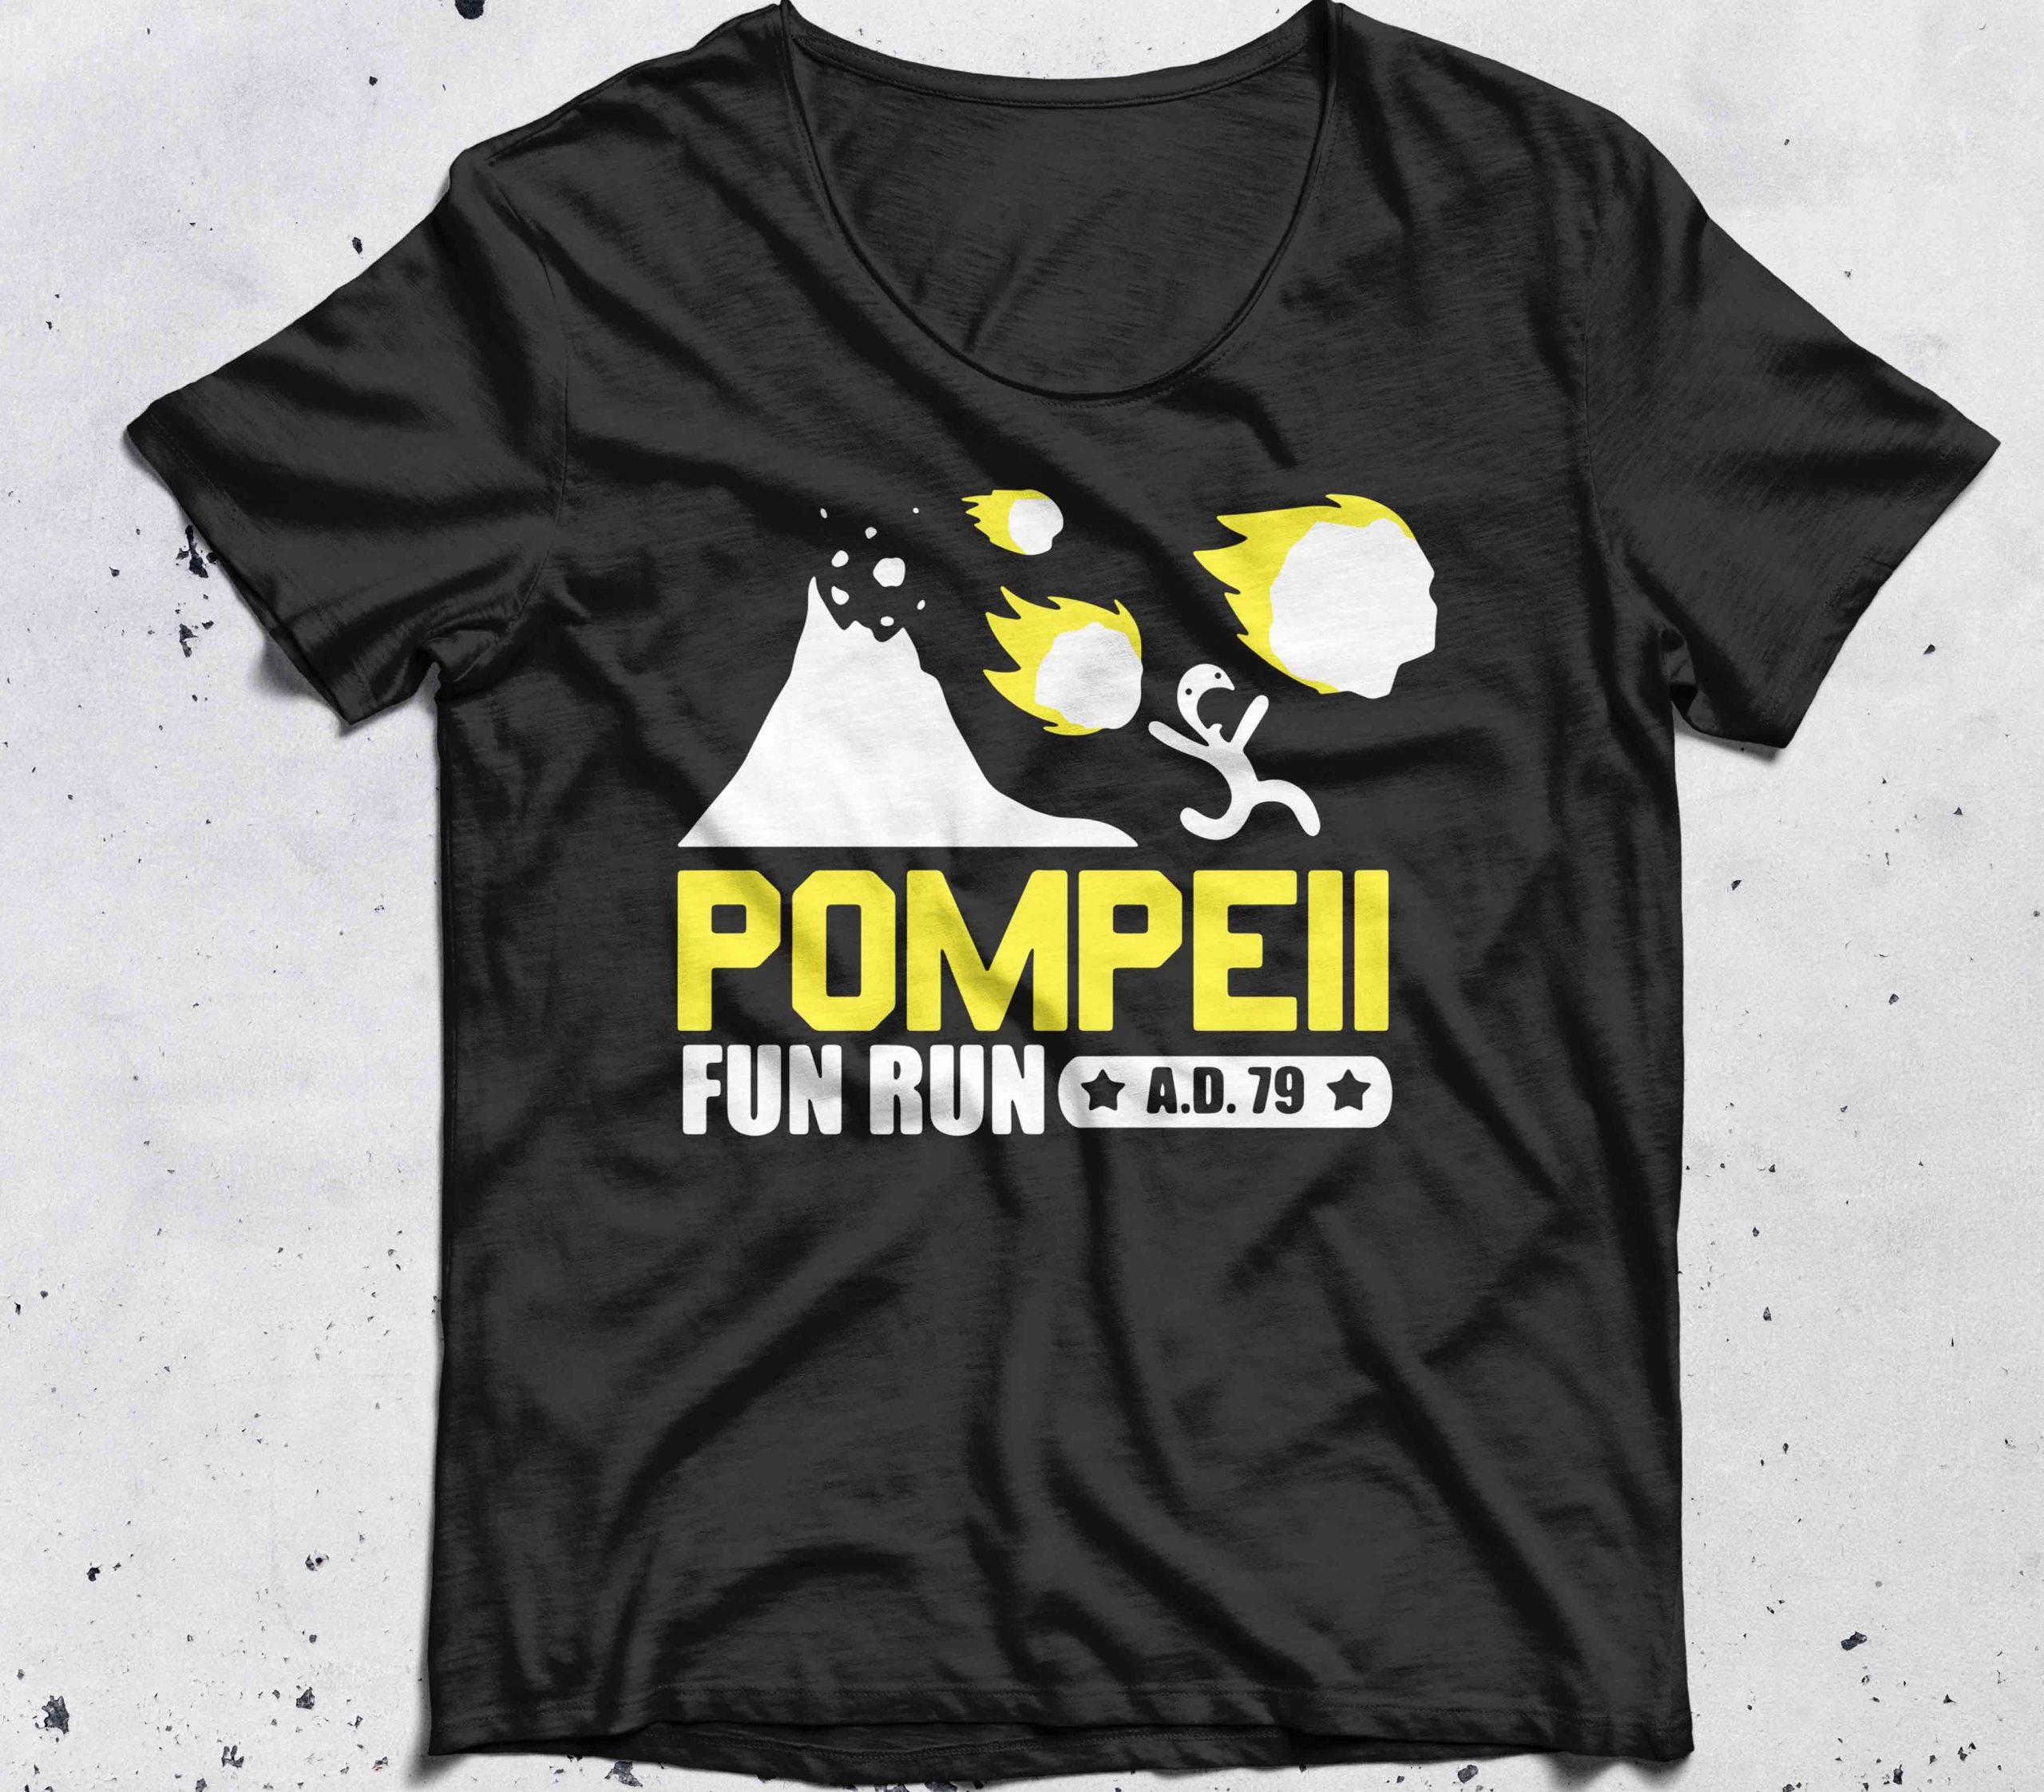 Pompeii Fun Run shirt